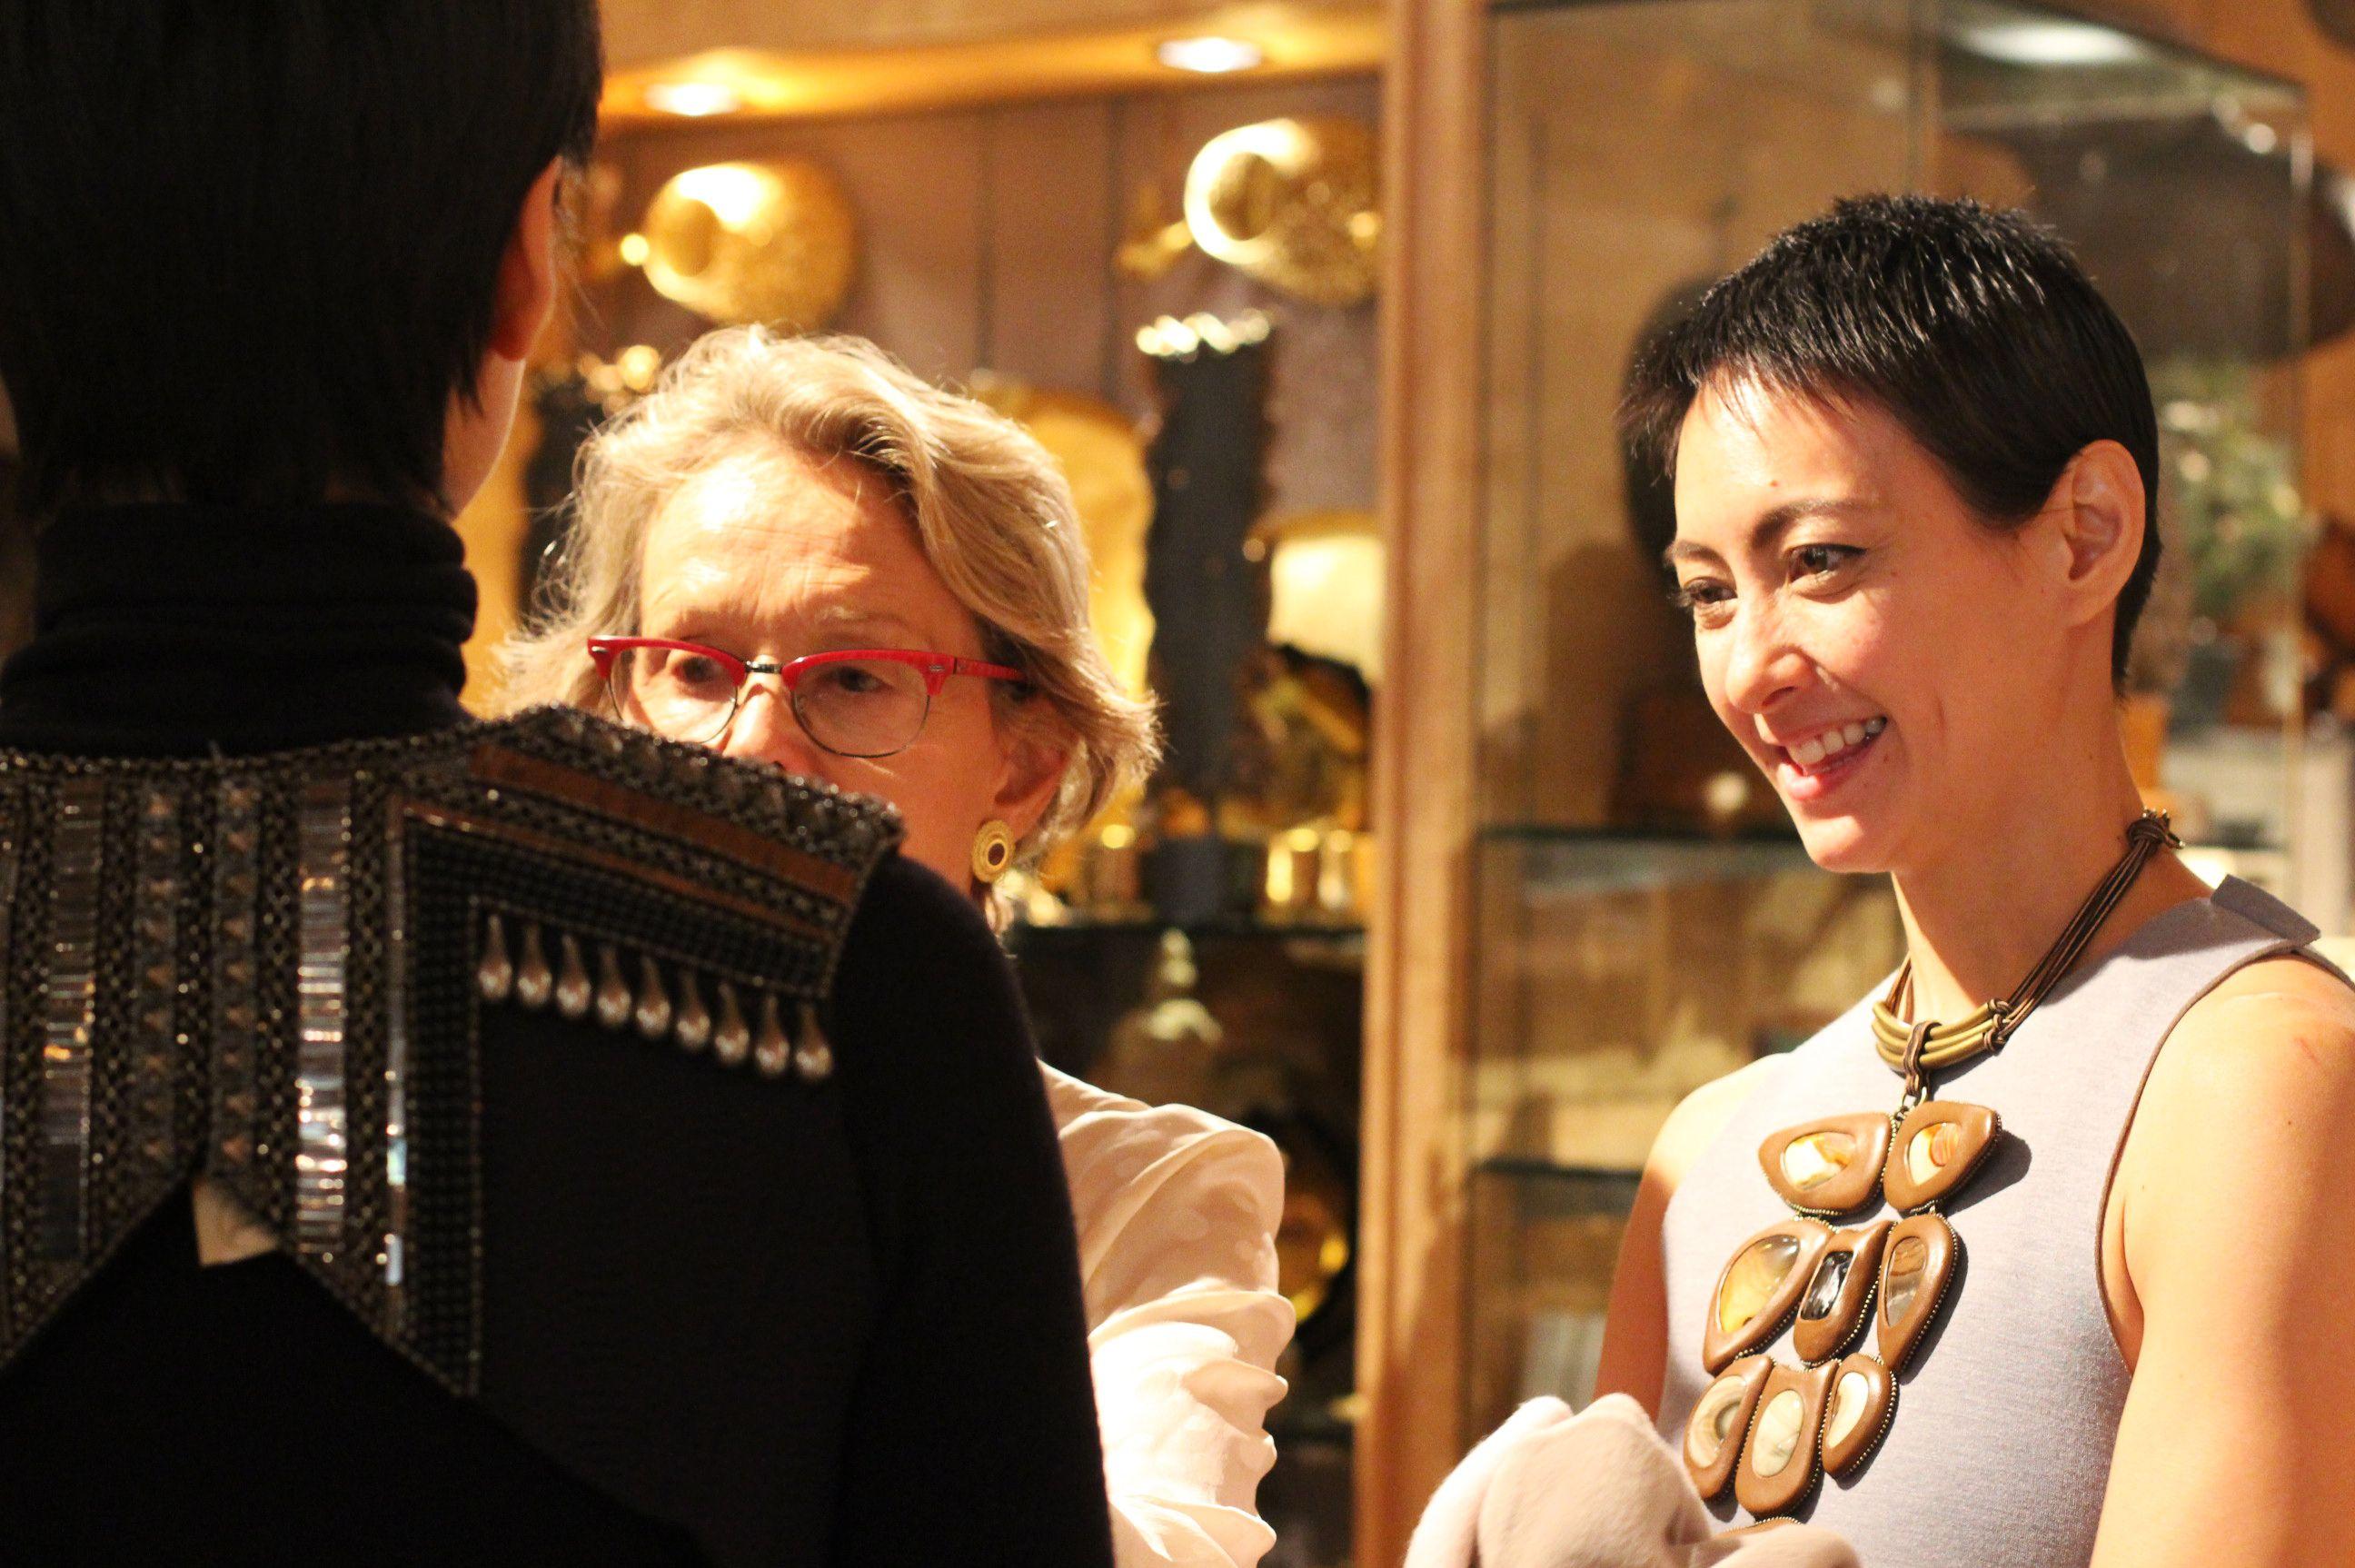 #beavaldes #jewelry #accessories #designer #filipina #filipinodesign #Philippines #AsiaSociety #AsiaStore #NYCEvent